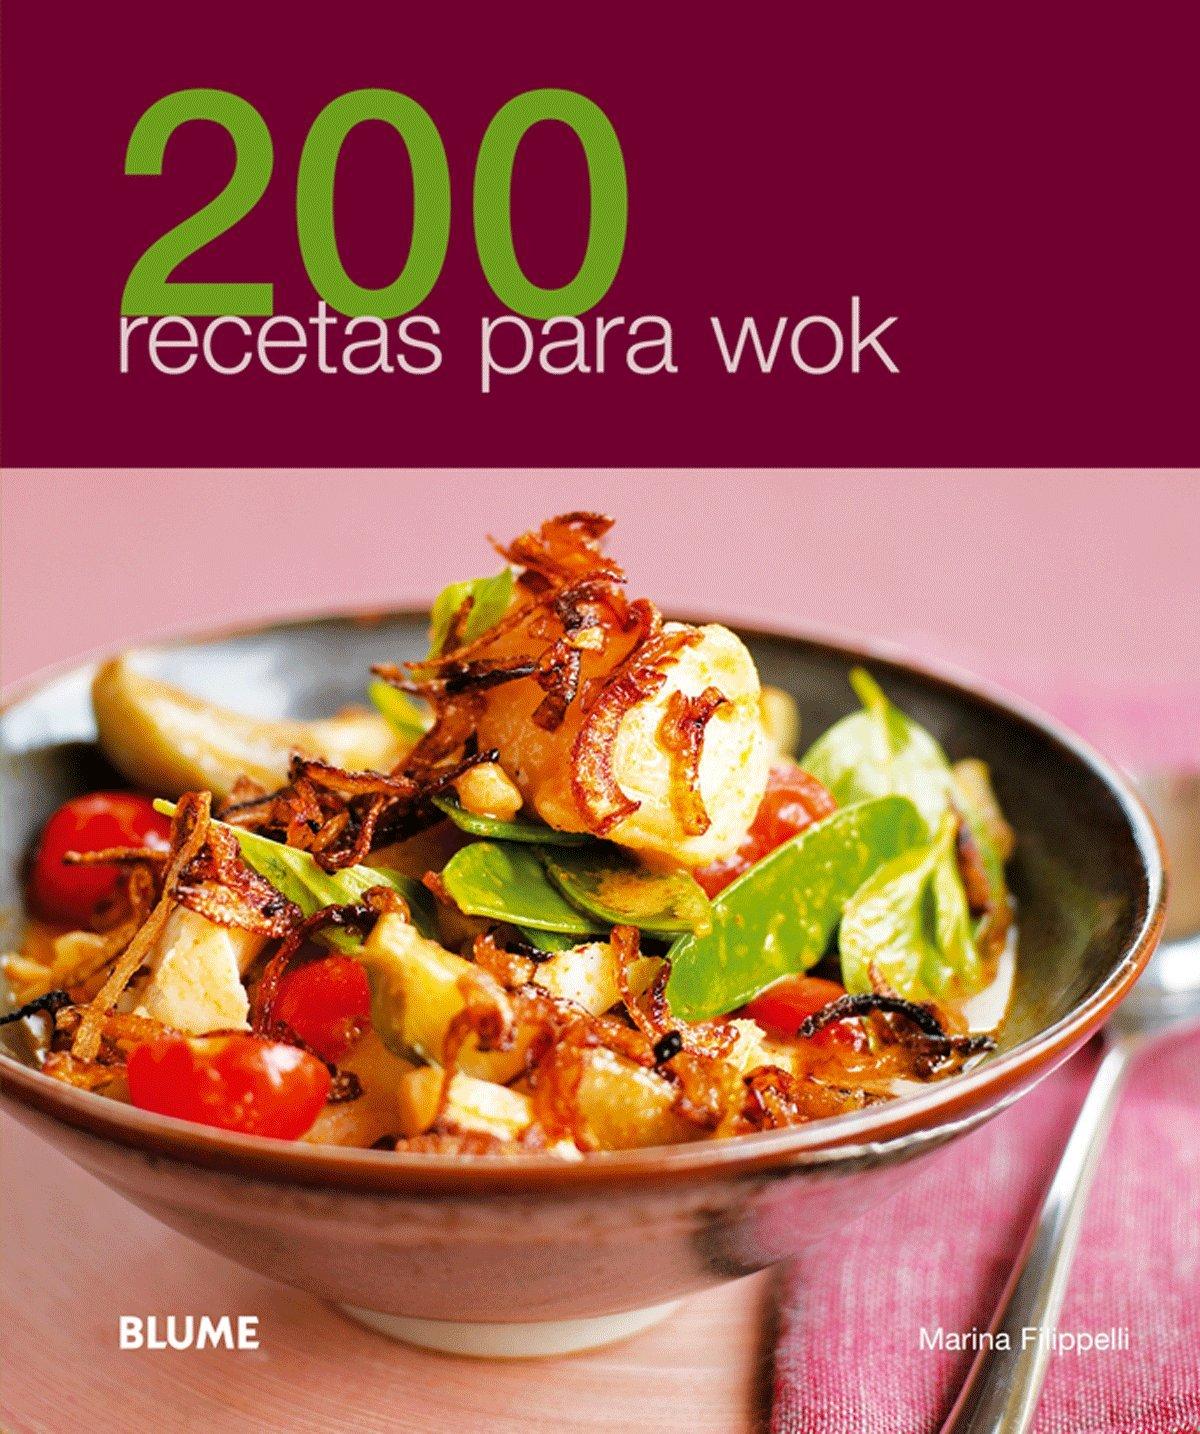 200 recetas para wok (Spanish Edition): Marina Filippelli: 9788480769082:  Amazon.com: Books